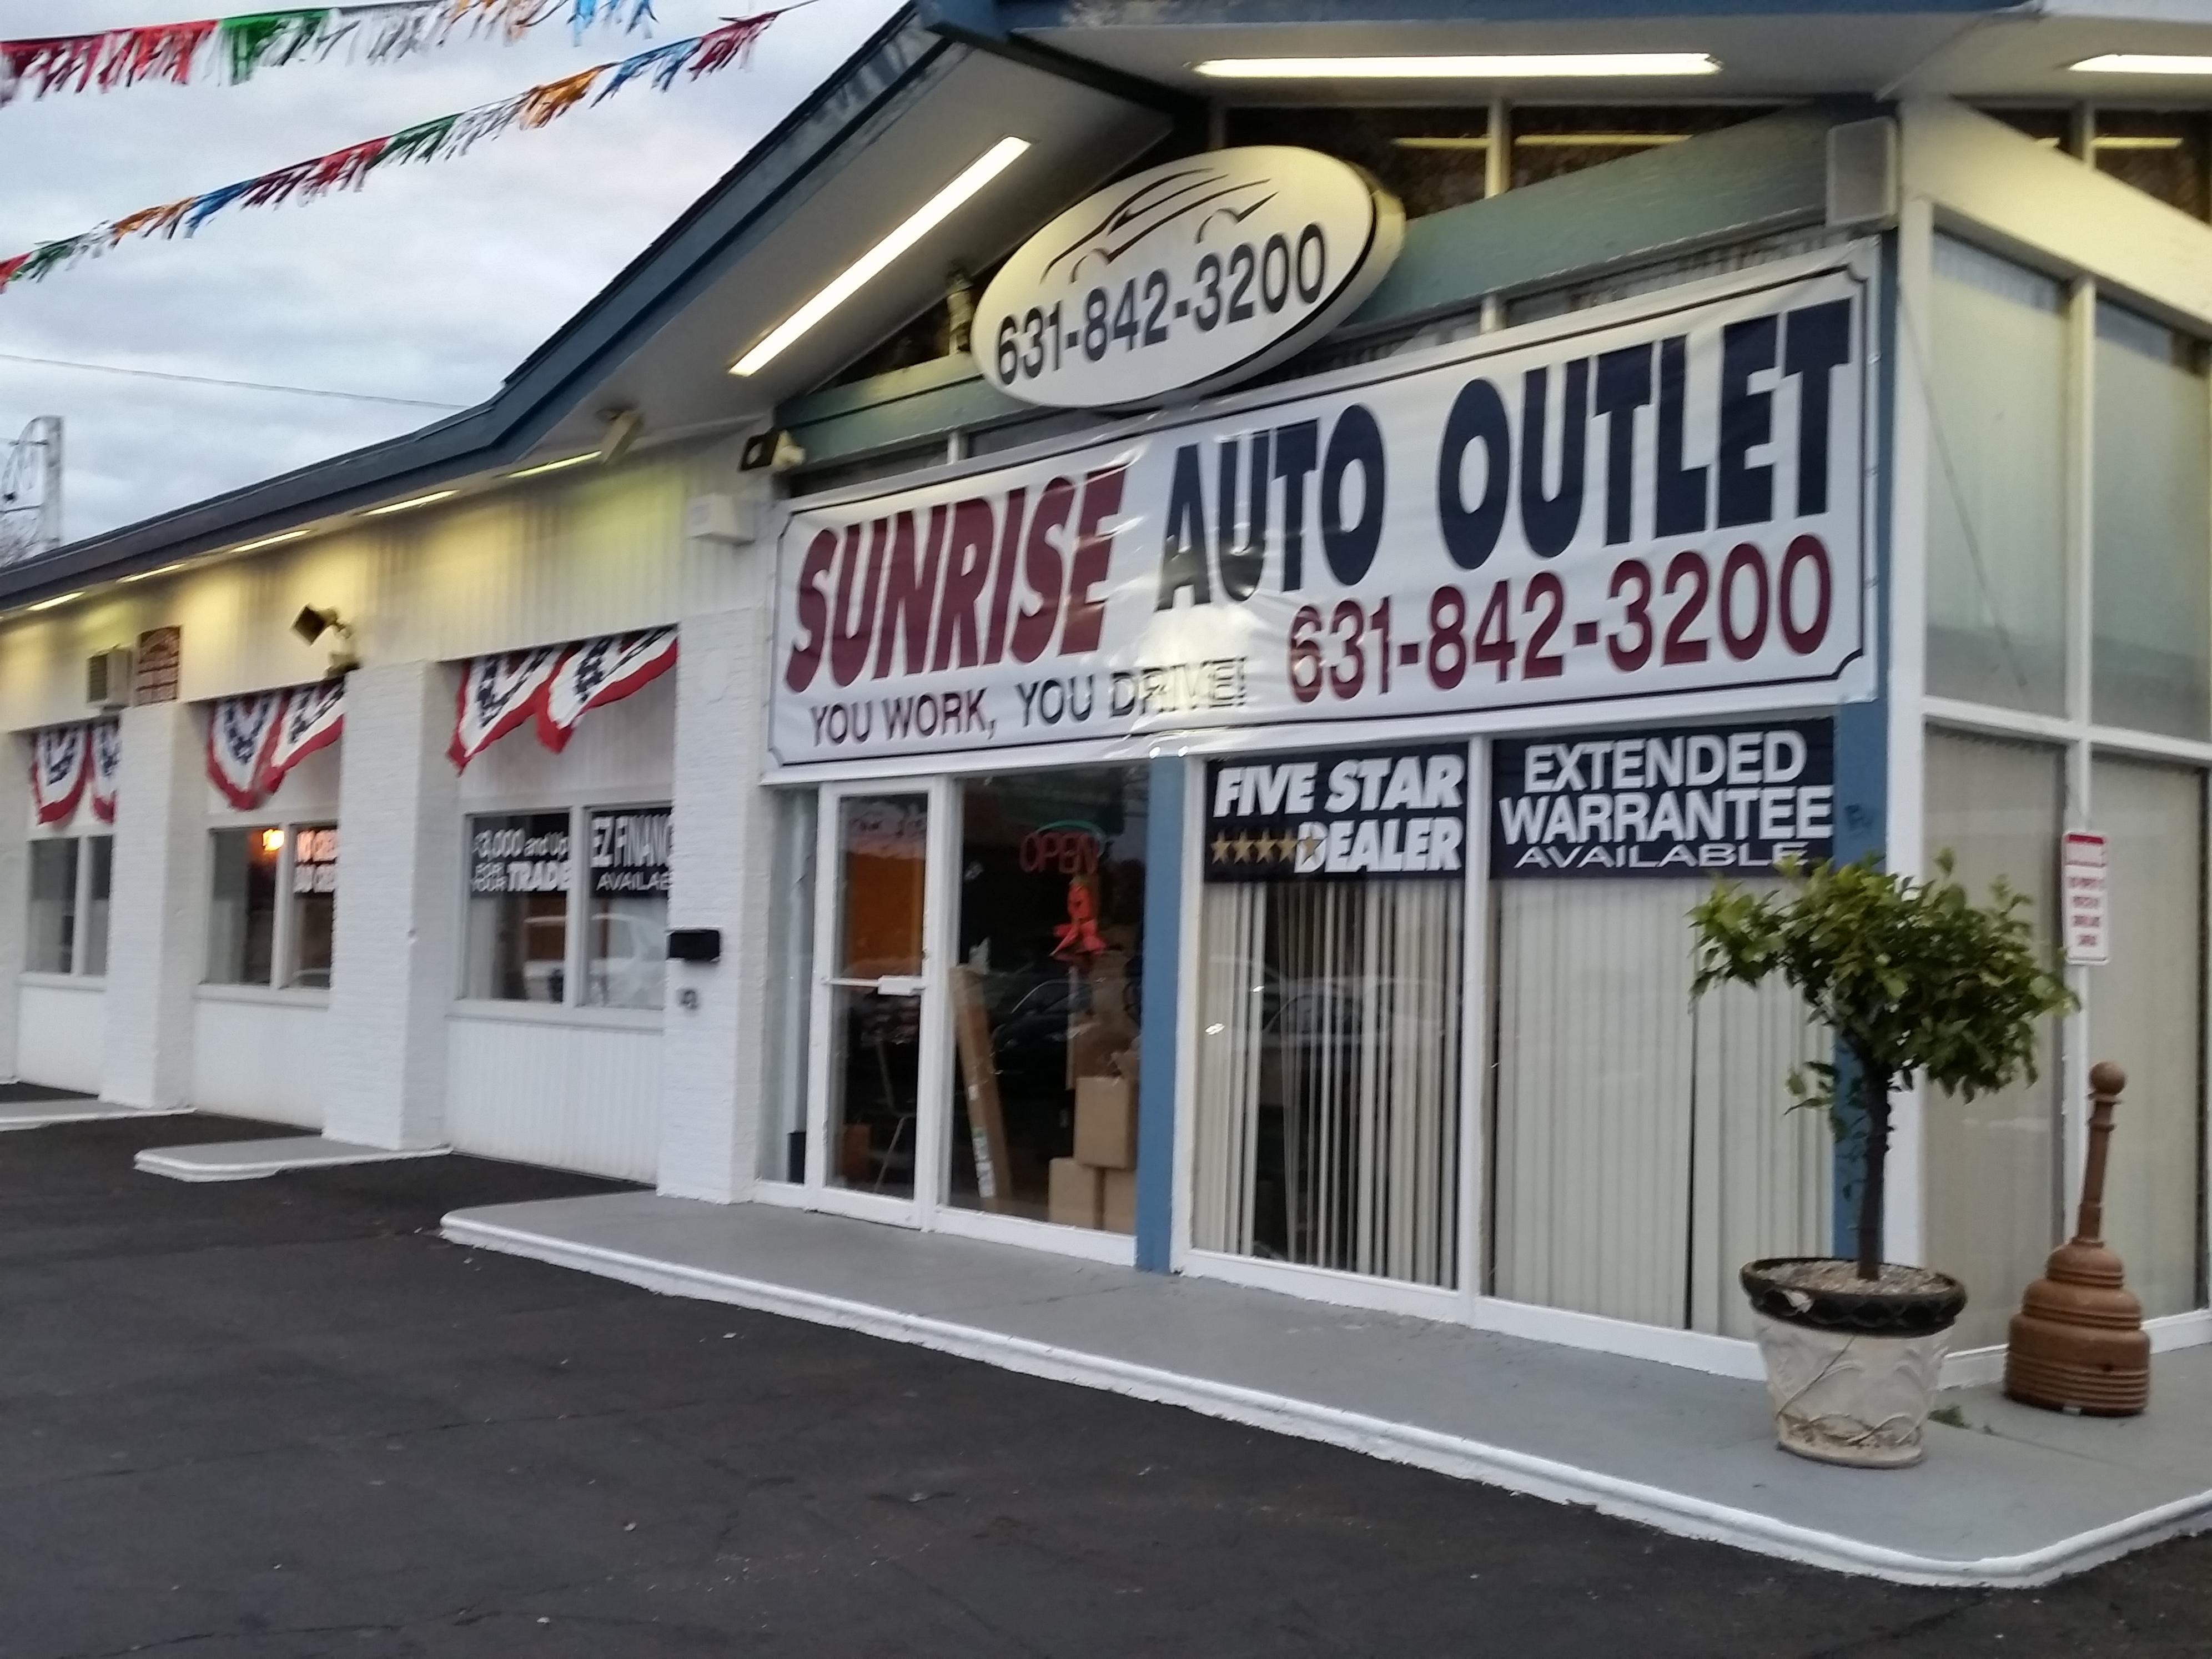 Sunrise auto outlet at 189 sunrise highway amityville ny for Mercedes benz of massapequa amityville ny